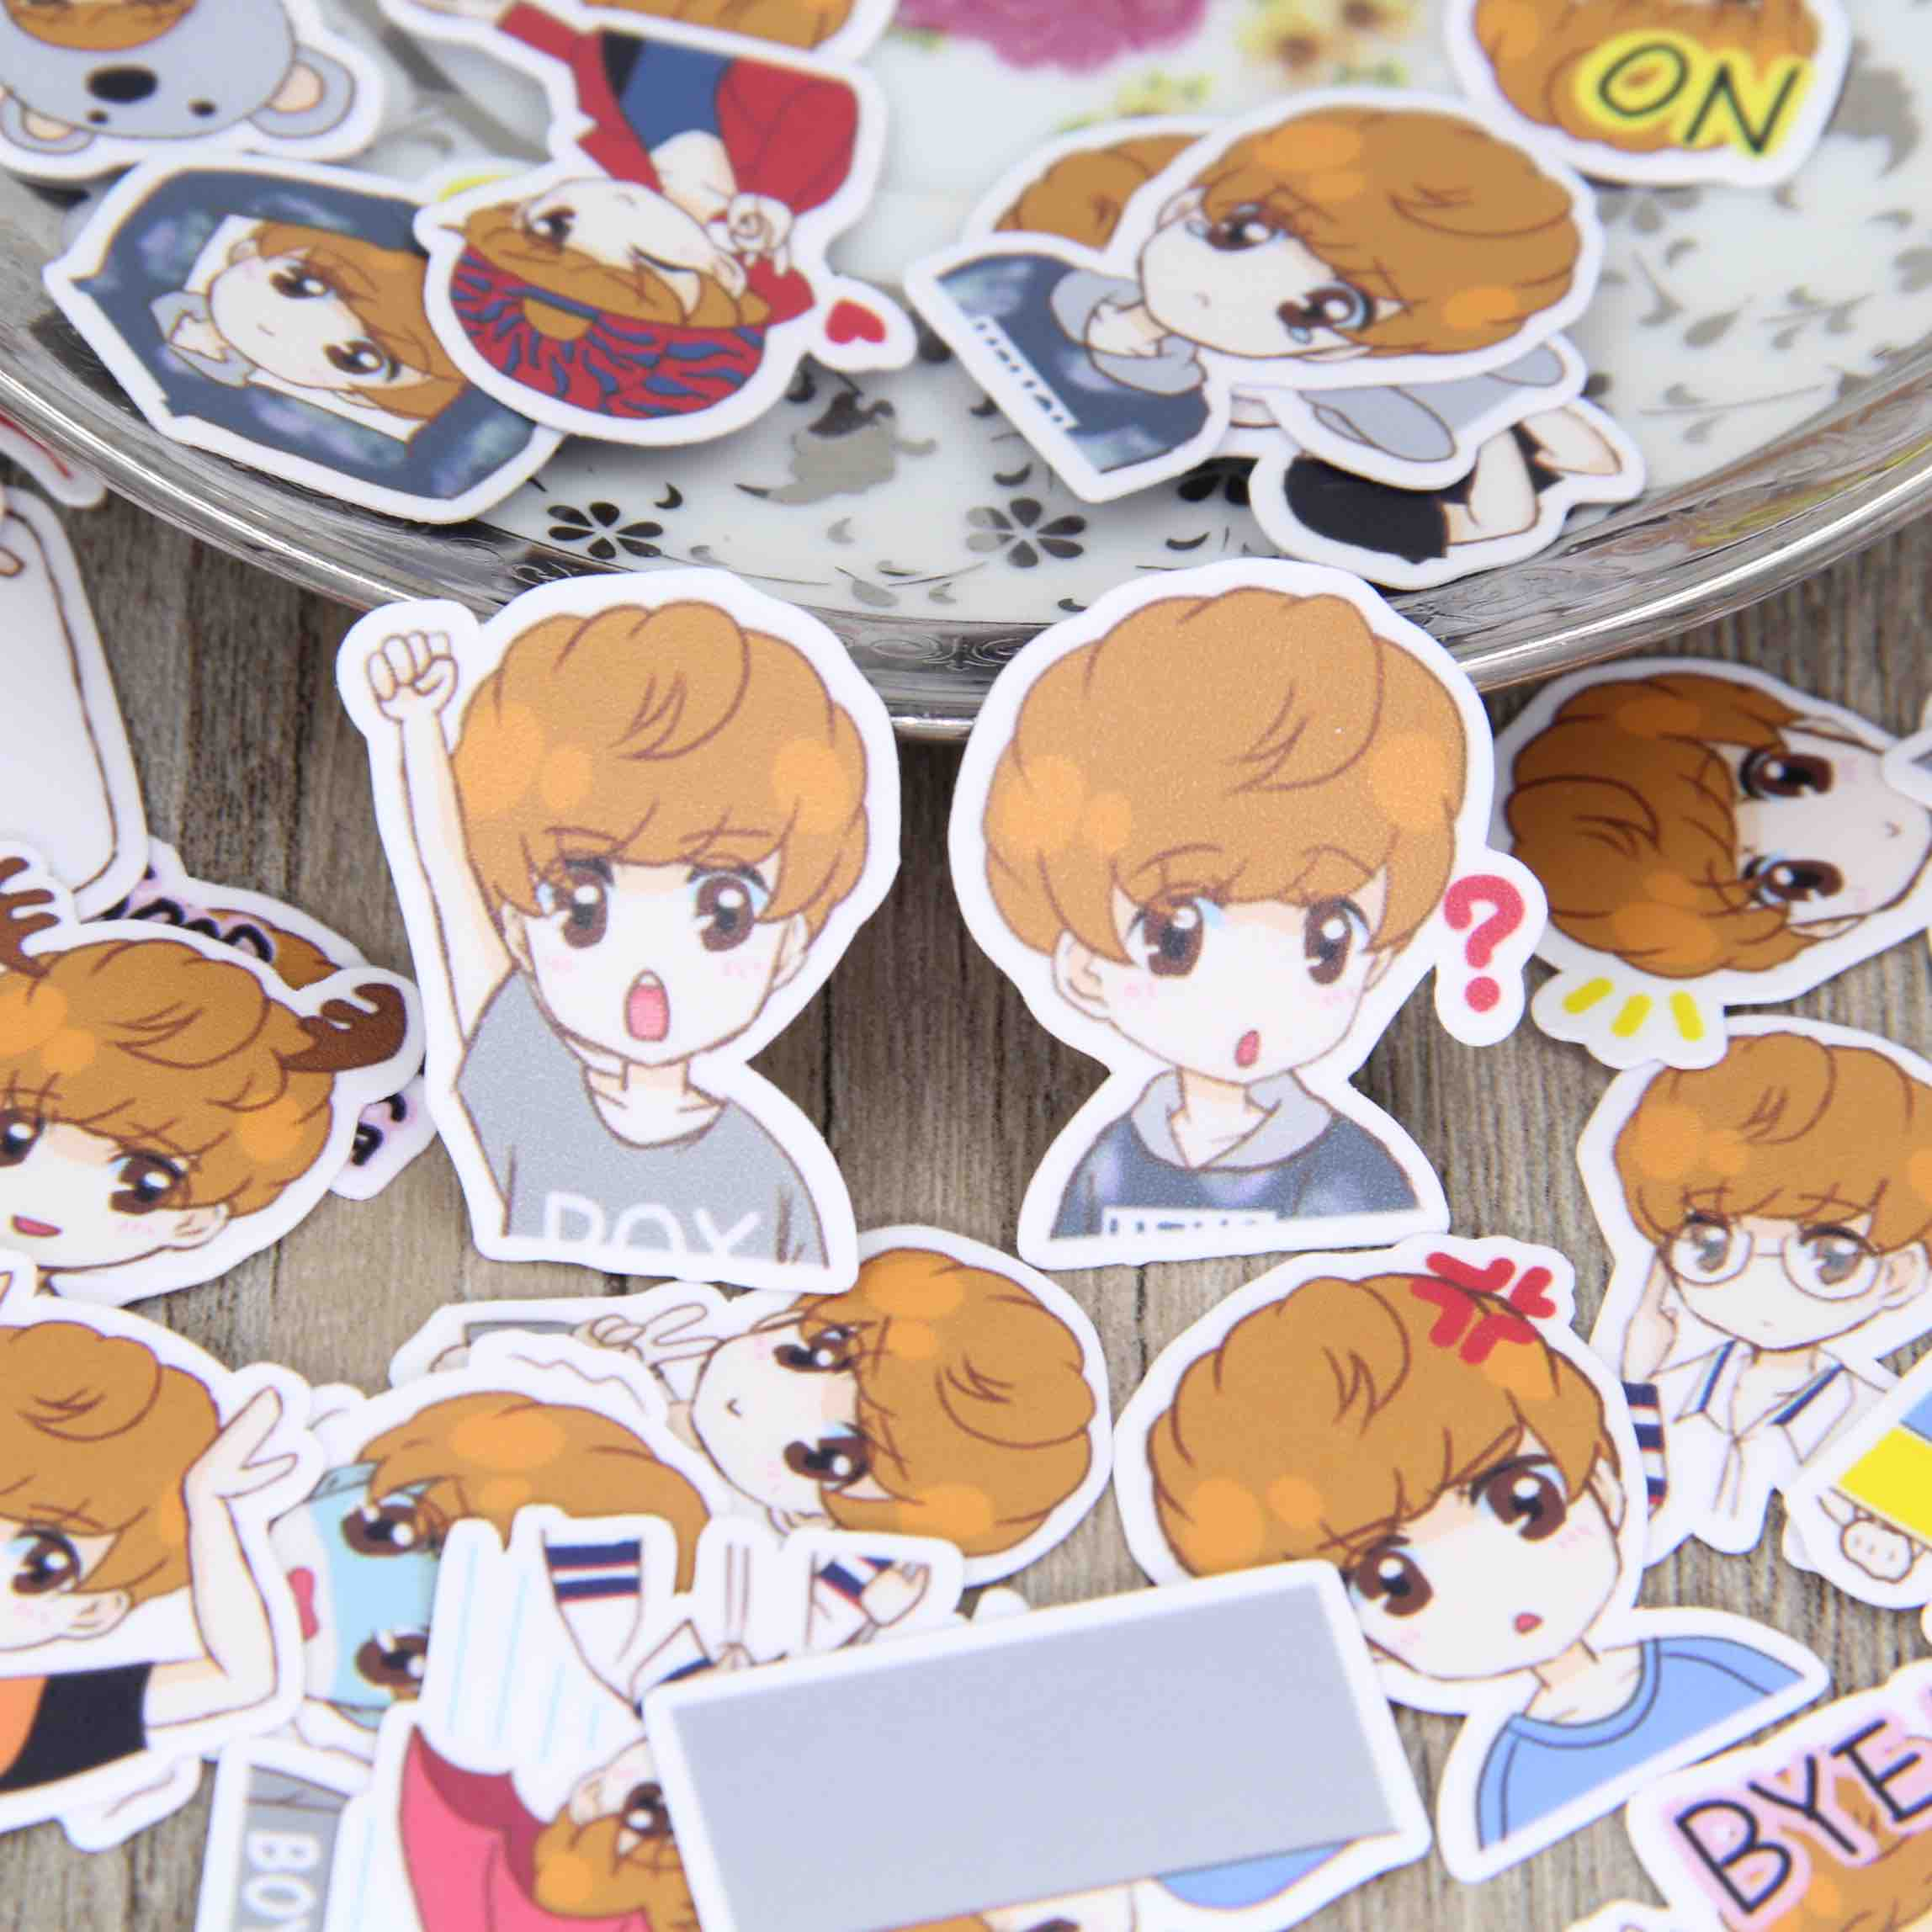 40pcs cute drawing little boy emotion book album deco scrapbooking stickers diy craft decorative sticker pack